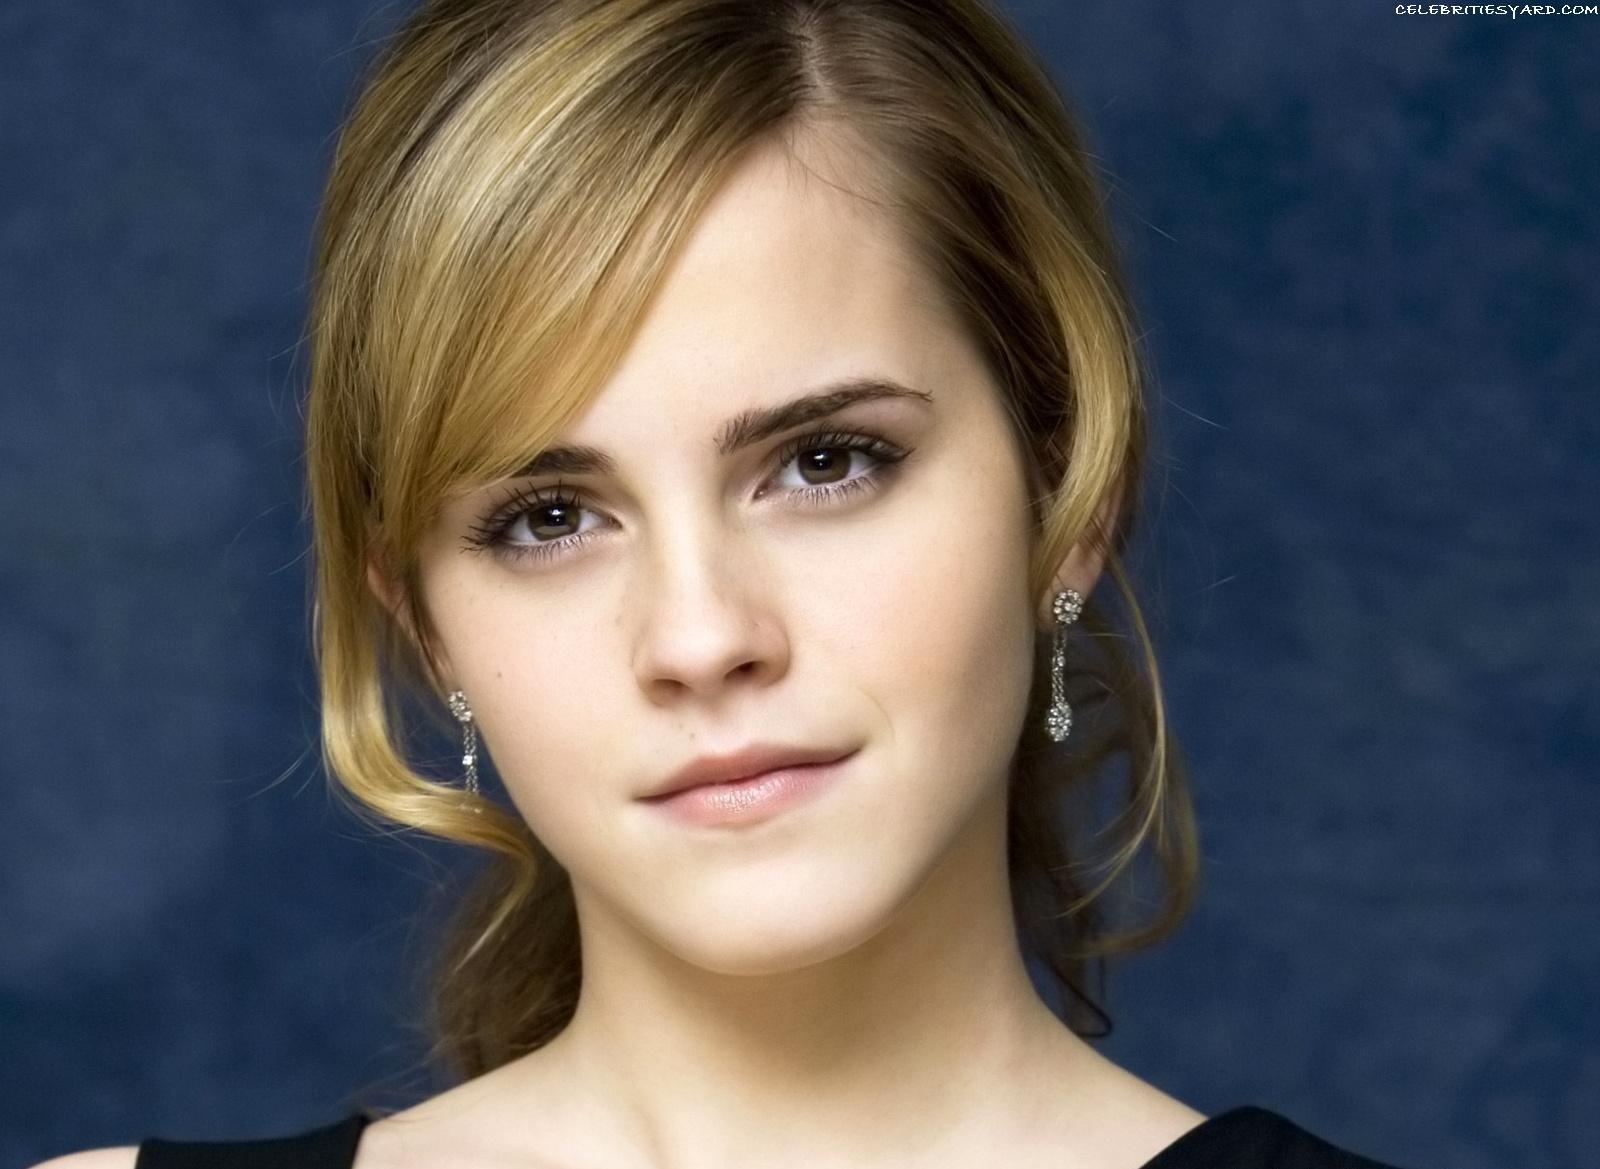 http://4.bp.blogspot.com/-hFmdPh8pGSk/Tt_OVkJOQZI/AAAAAAAADKU/3flwx6aZYLM/s1600/Girl+Hairstyle%252C+Photo+Gallery%252C+Emma+Watson+Hairstyles%252C+Celebrity+Emma+Watson+Hairstyles%252C+Emma+Watson+Hairstyles+Photo%252C+Latest+Emma+Watson+Hairstyles%252C+Emma+Watson+Hairstyles+Cutting+%252839%2529.jpg